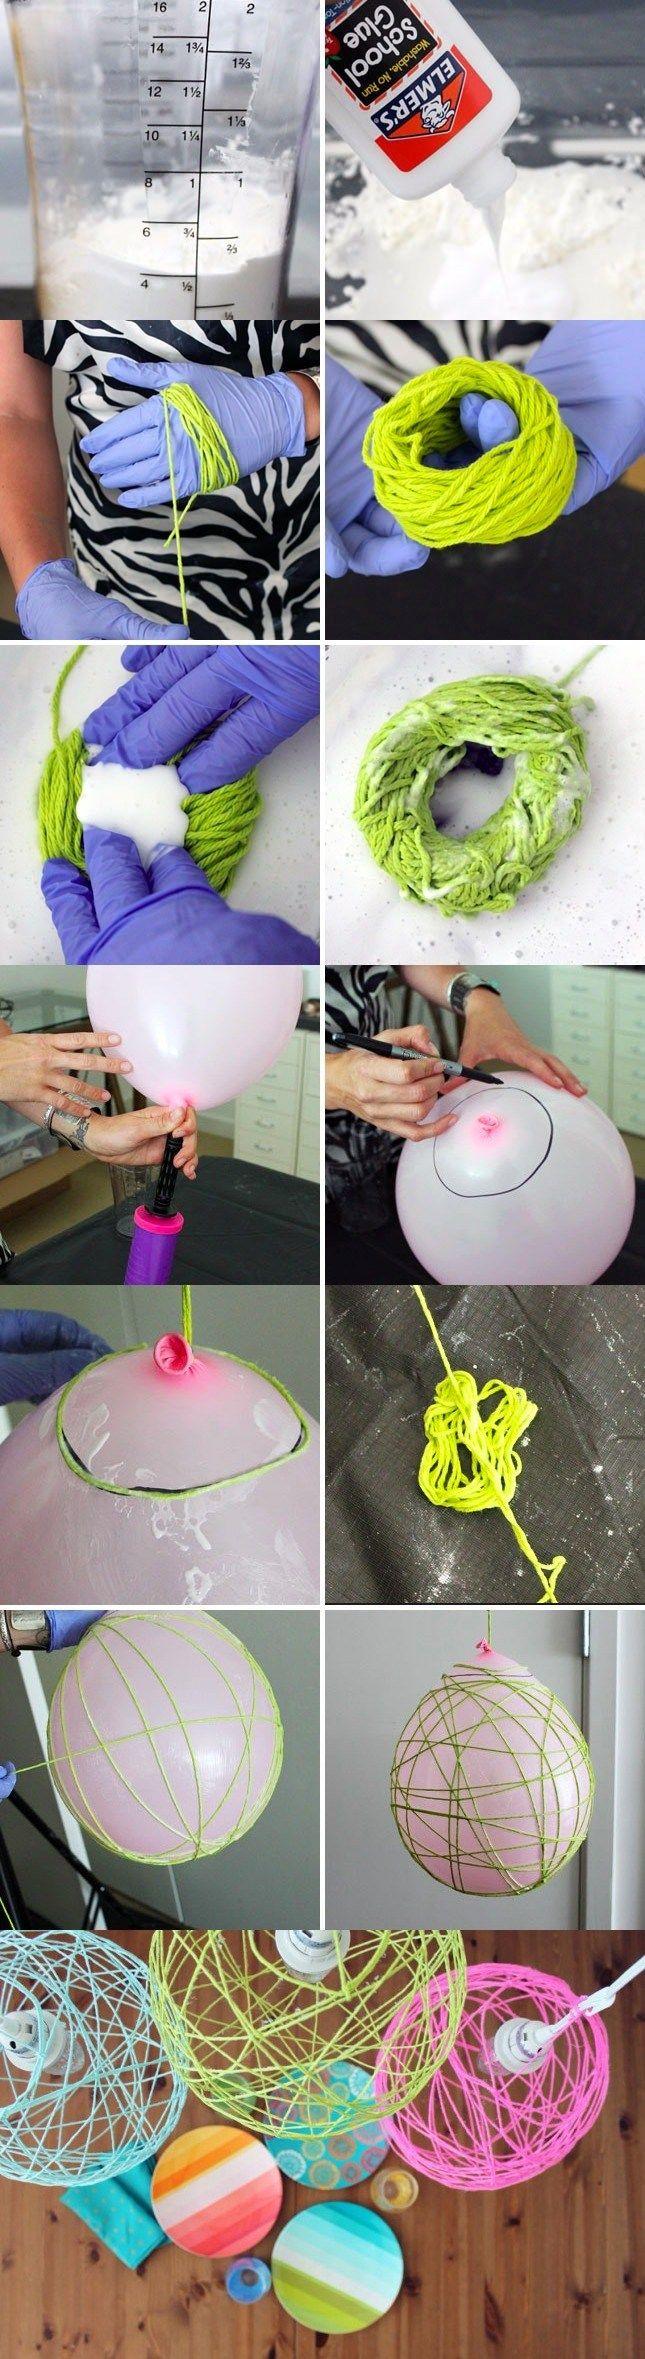 Lámparas de lana - brit.co - DIY Yarn Lanterns